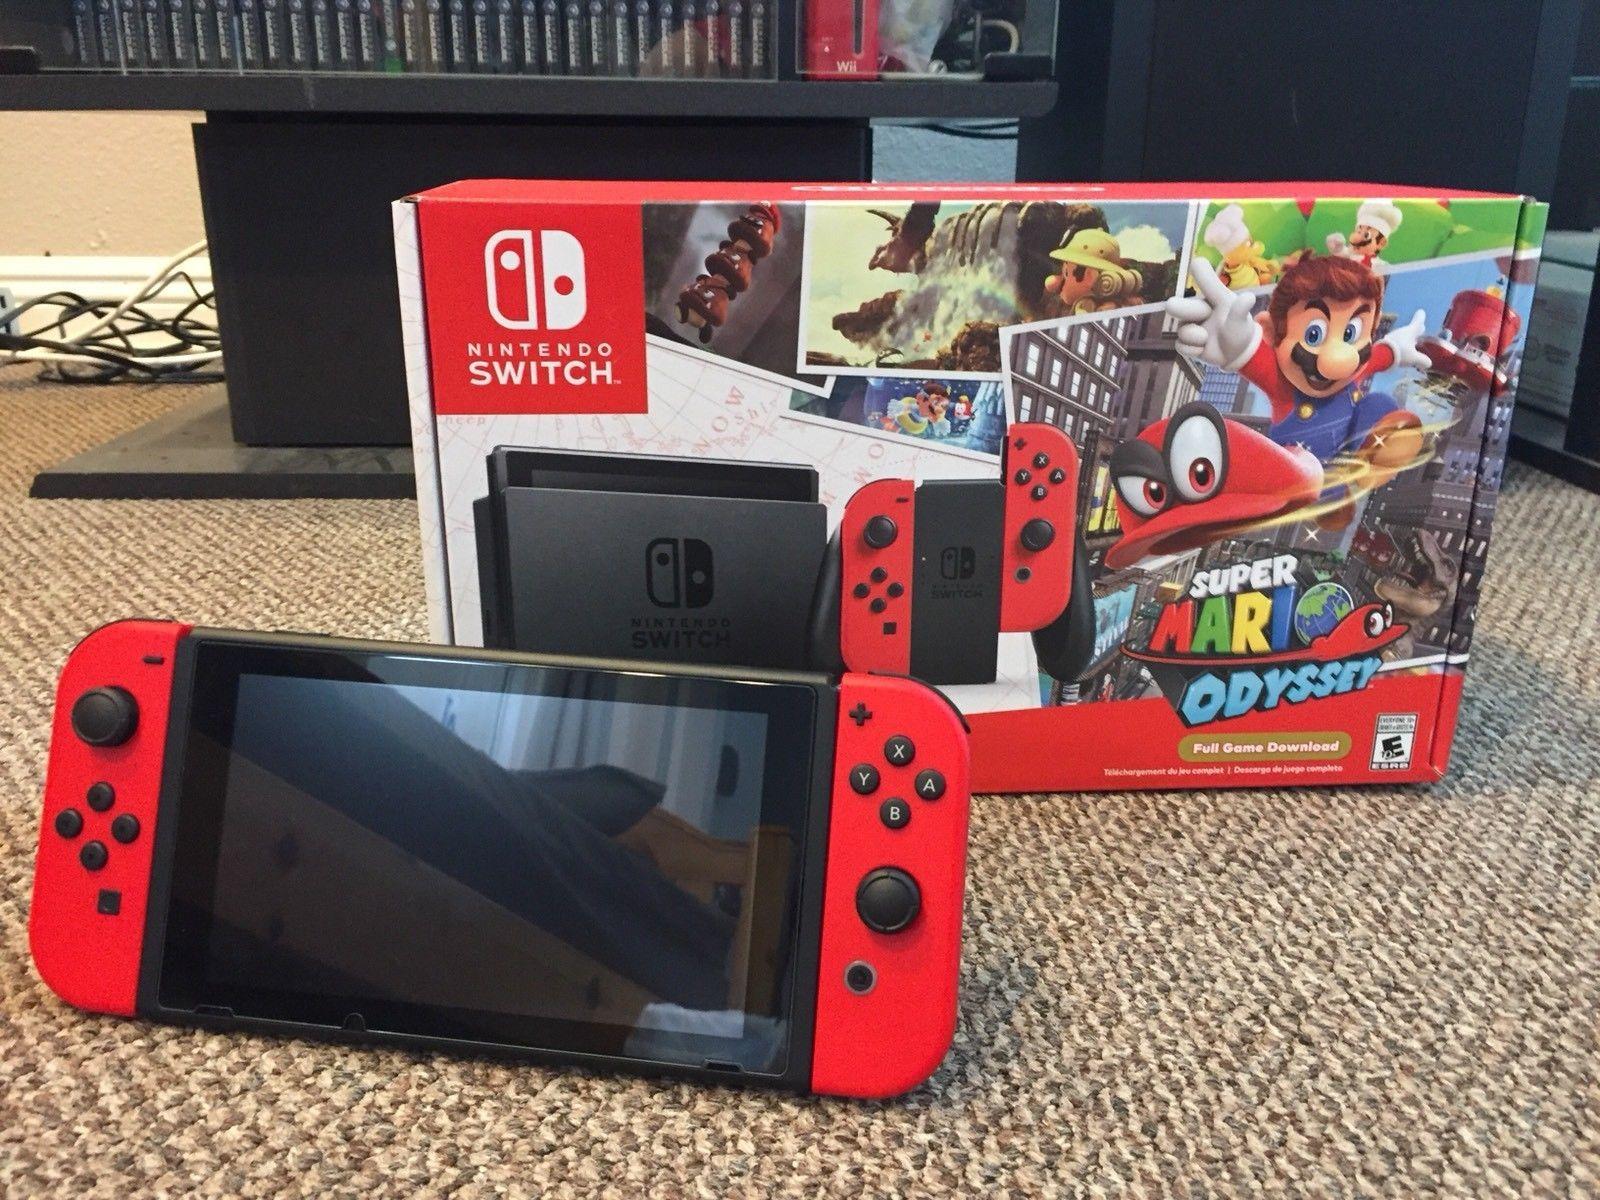 Nintendo Switch Super Mario Odyssey Edition +3 Games, 200Gb Microsd,